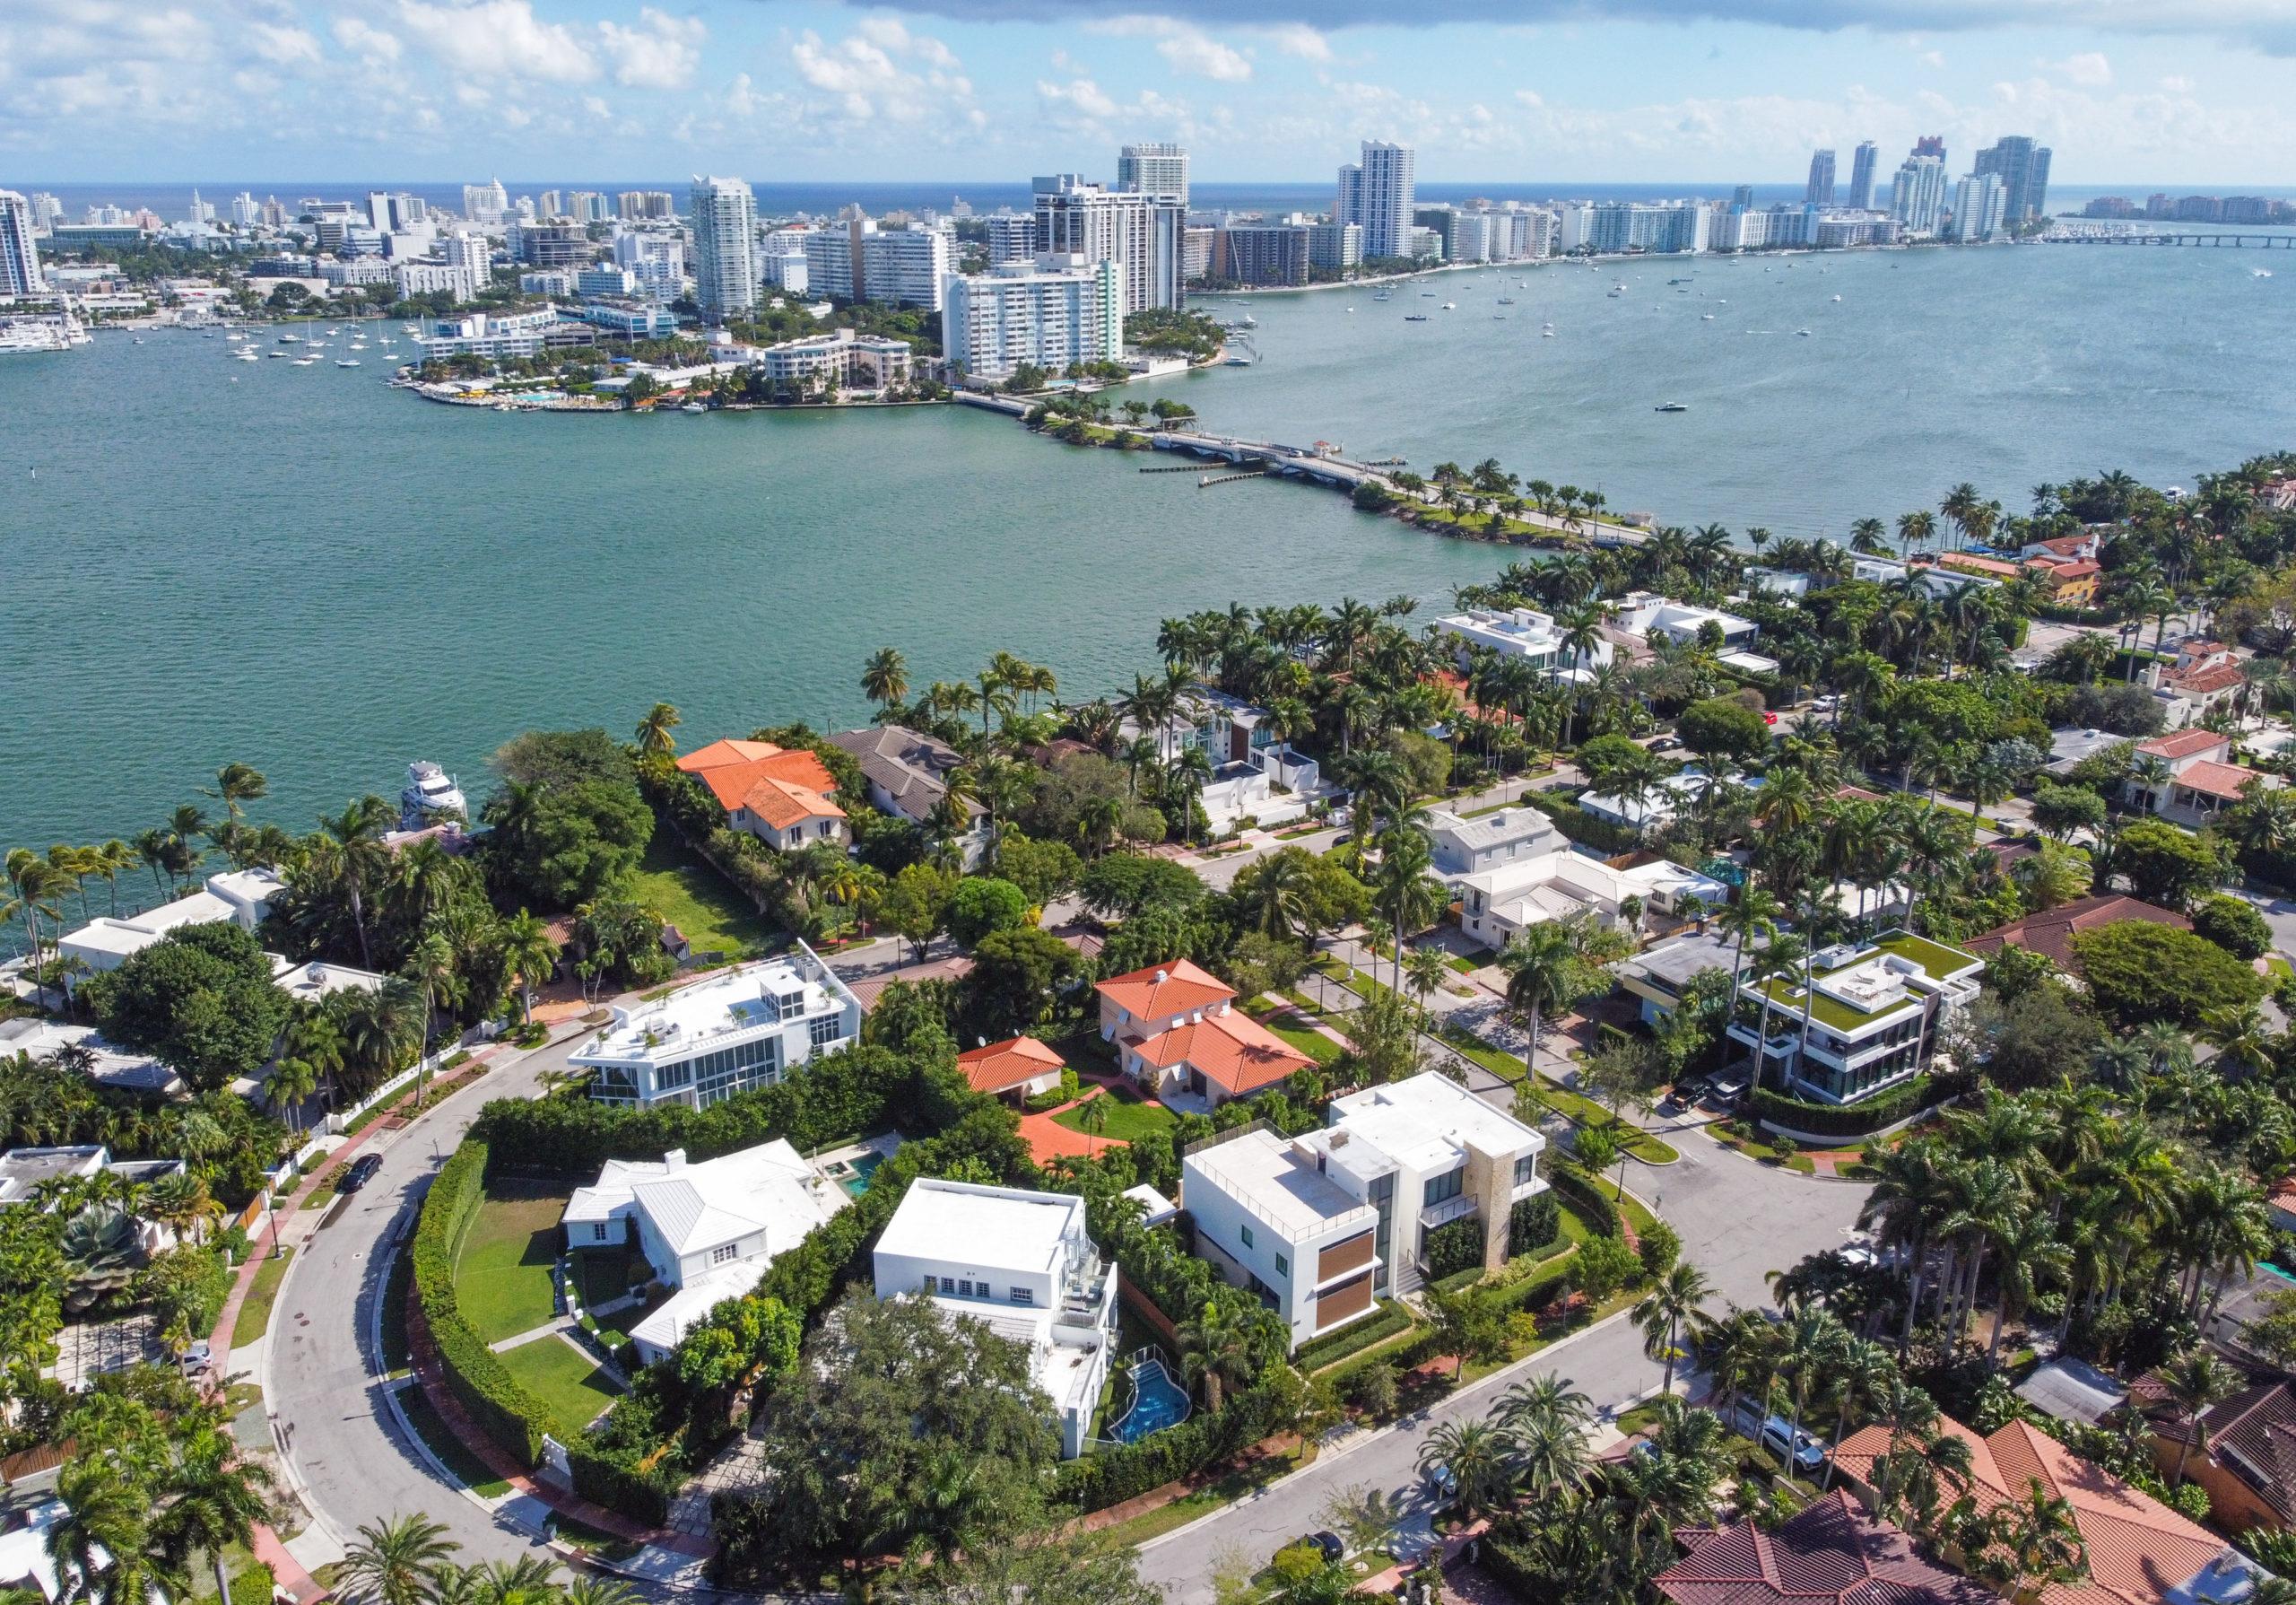 The Best Private Schools near Miami Beach – Where Should You Live?